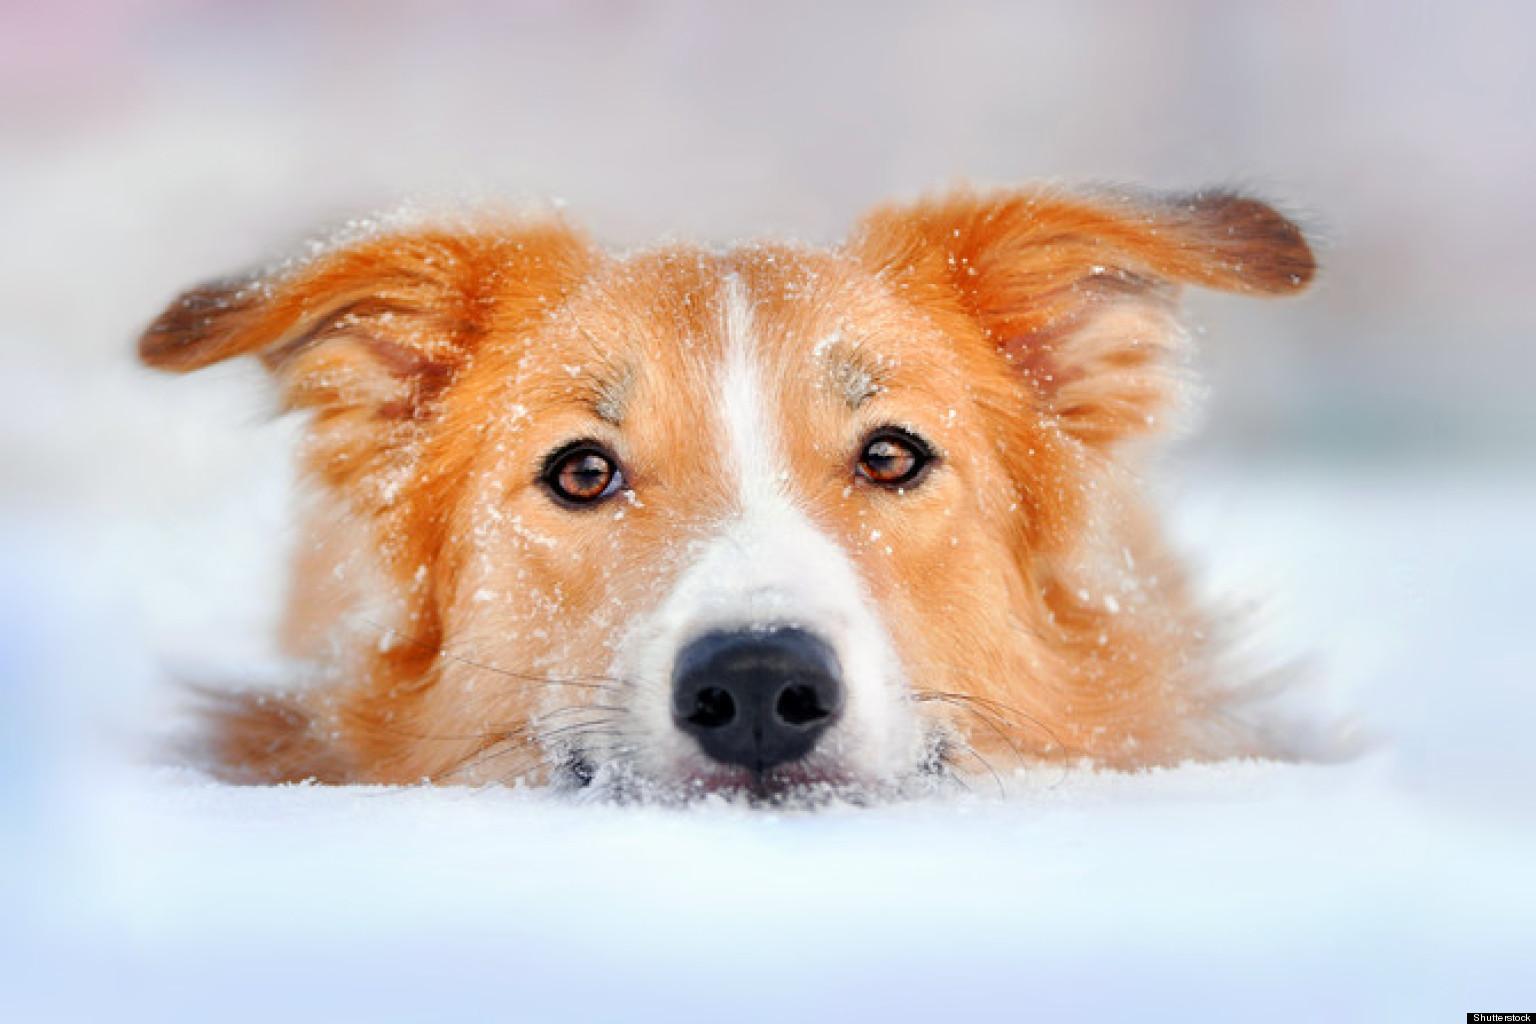 Pet Travel Tips: Preparing Felix & Fido     By Dr. Jodi Reed